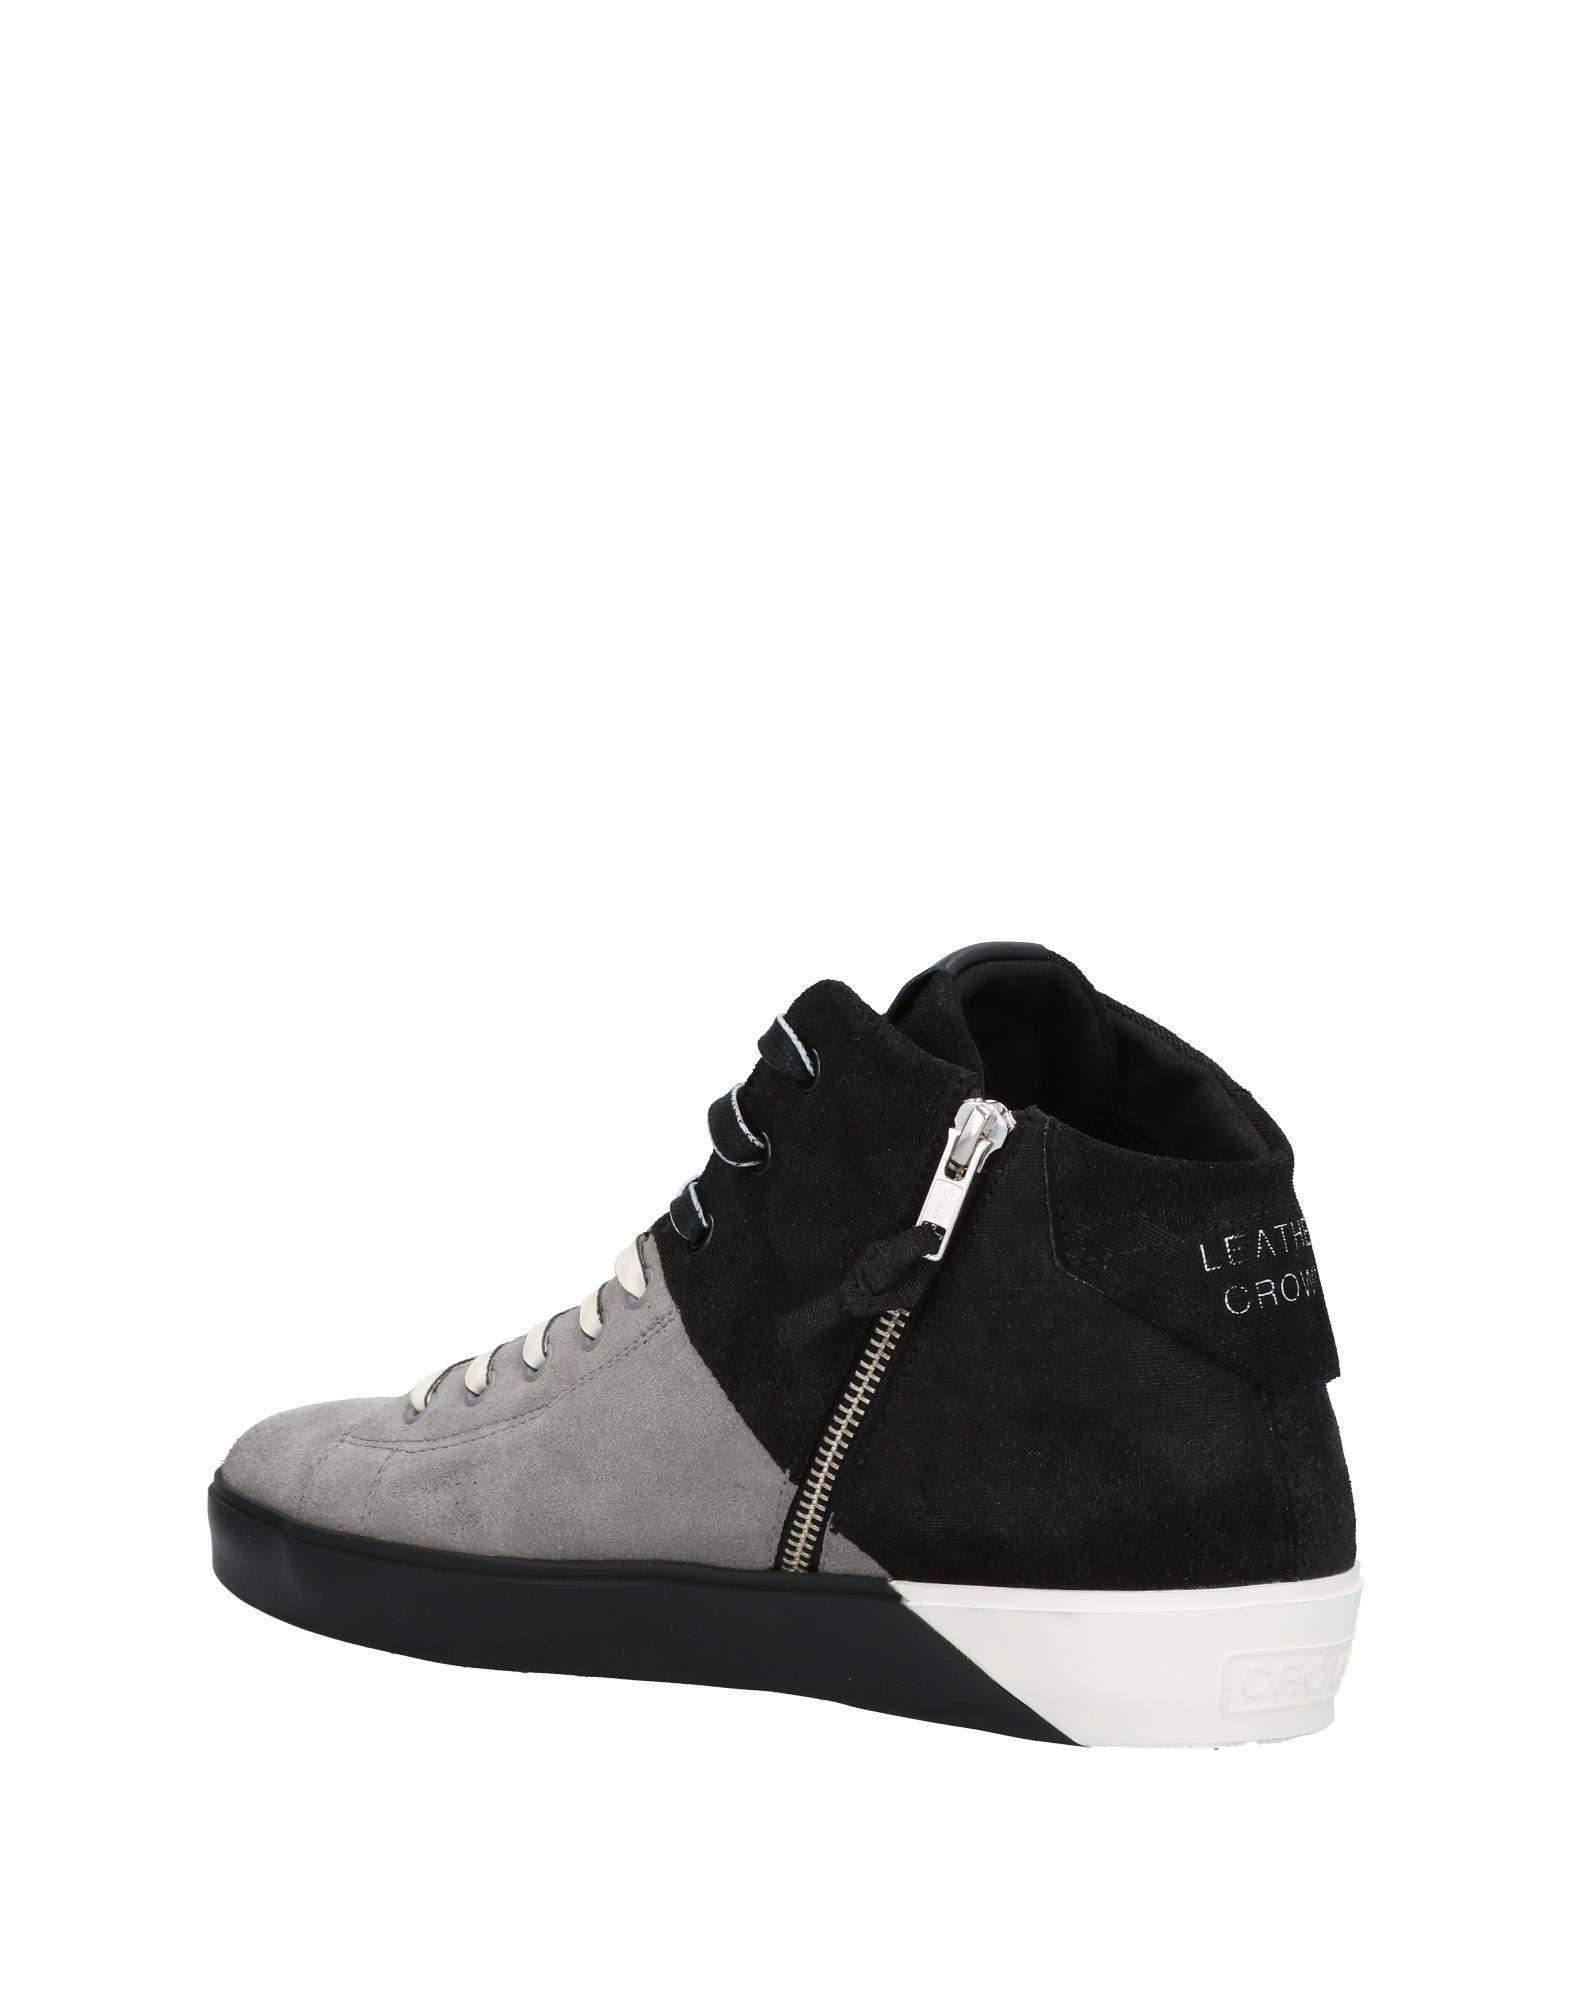 Leather  Crown Sneakers Herren  Leather 11453732QA Neue Schuhe 2c6b4f